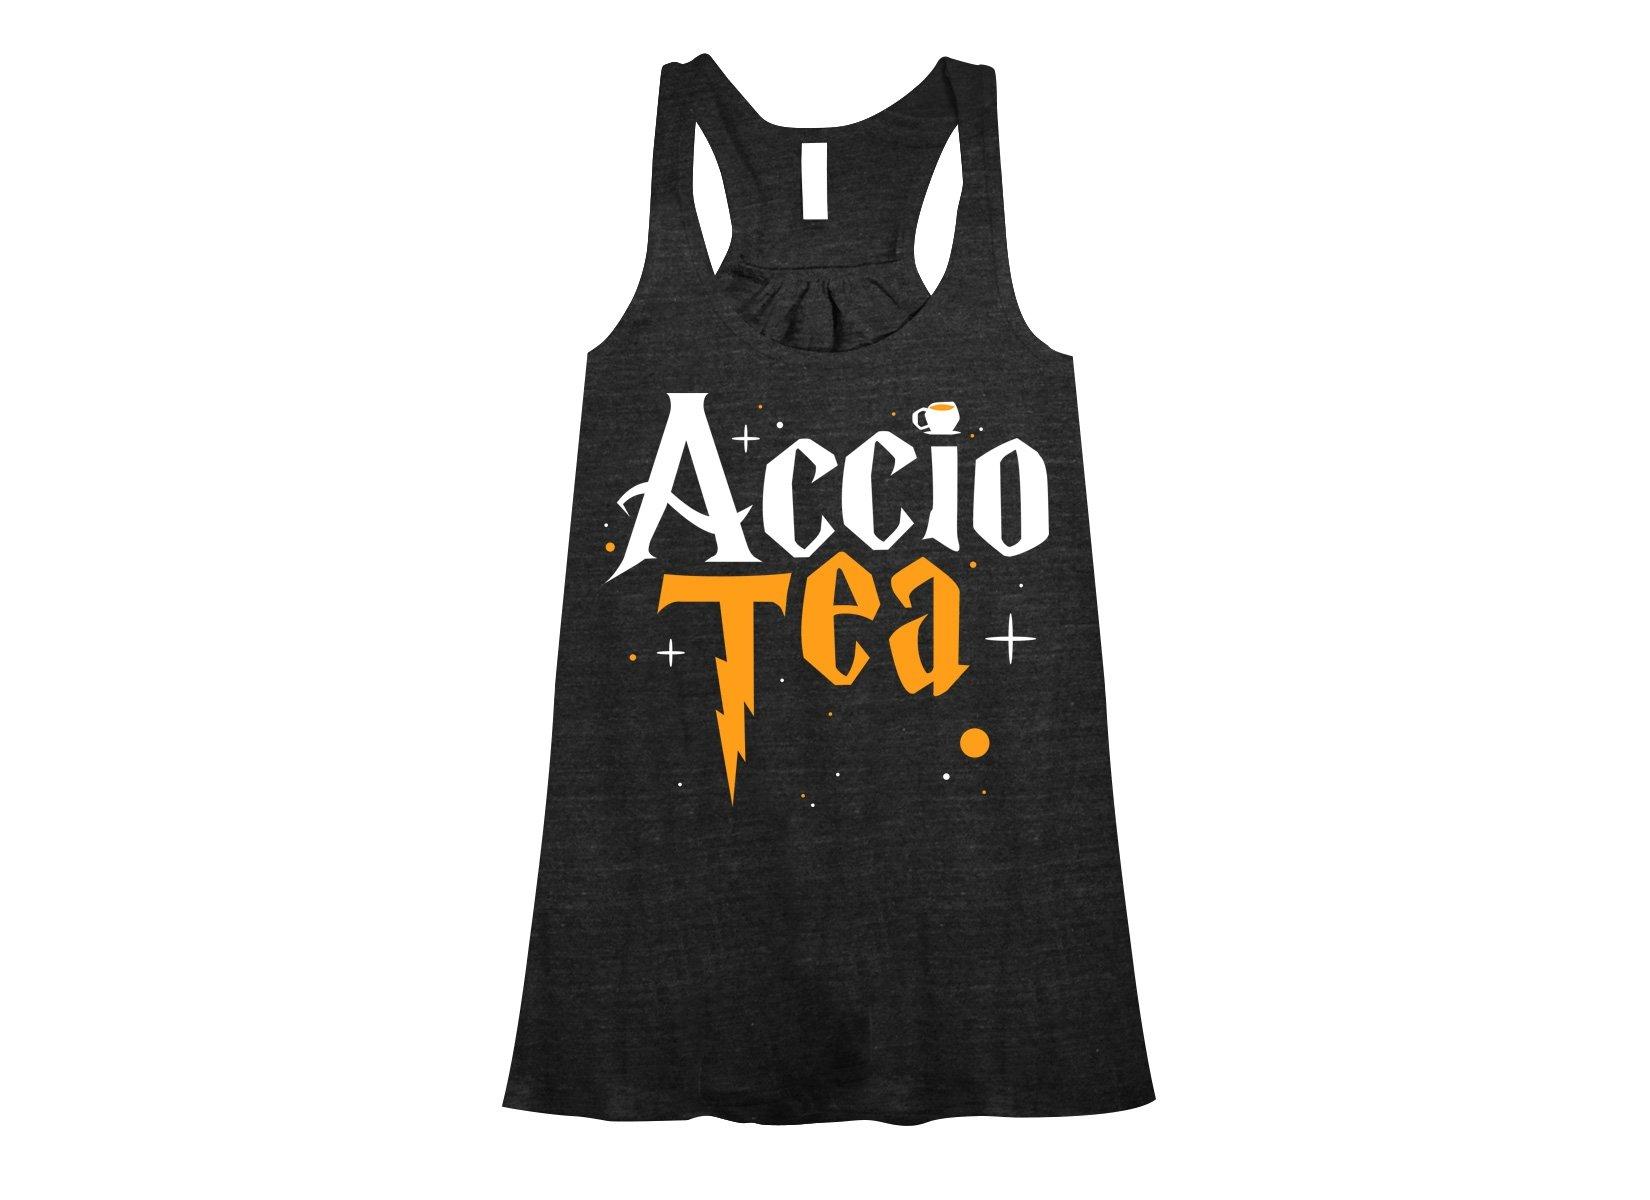 Accio Tea on Womens Tanks T-Shirt